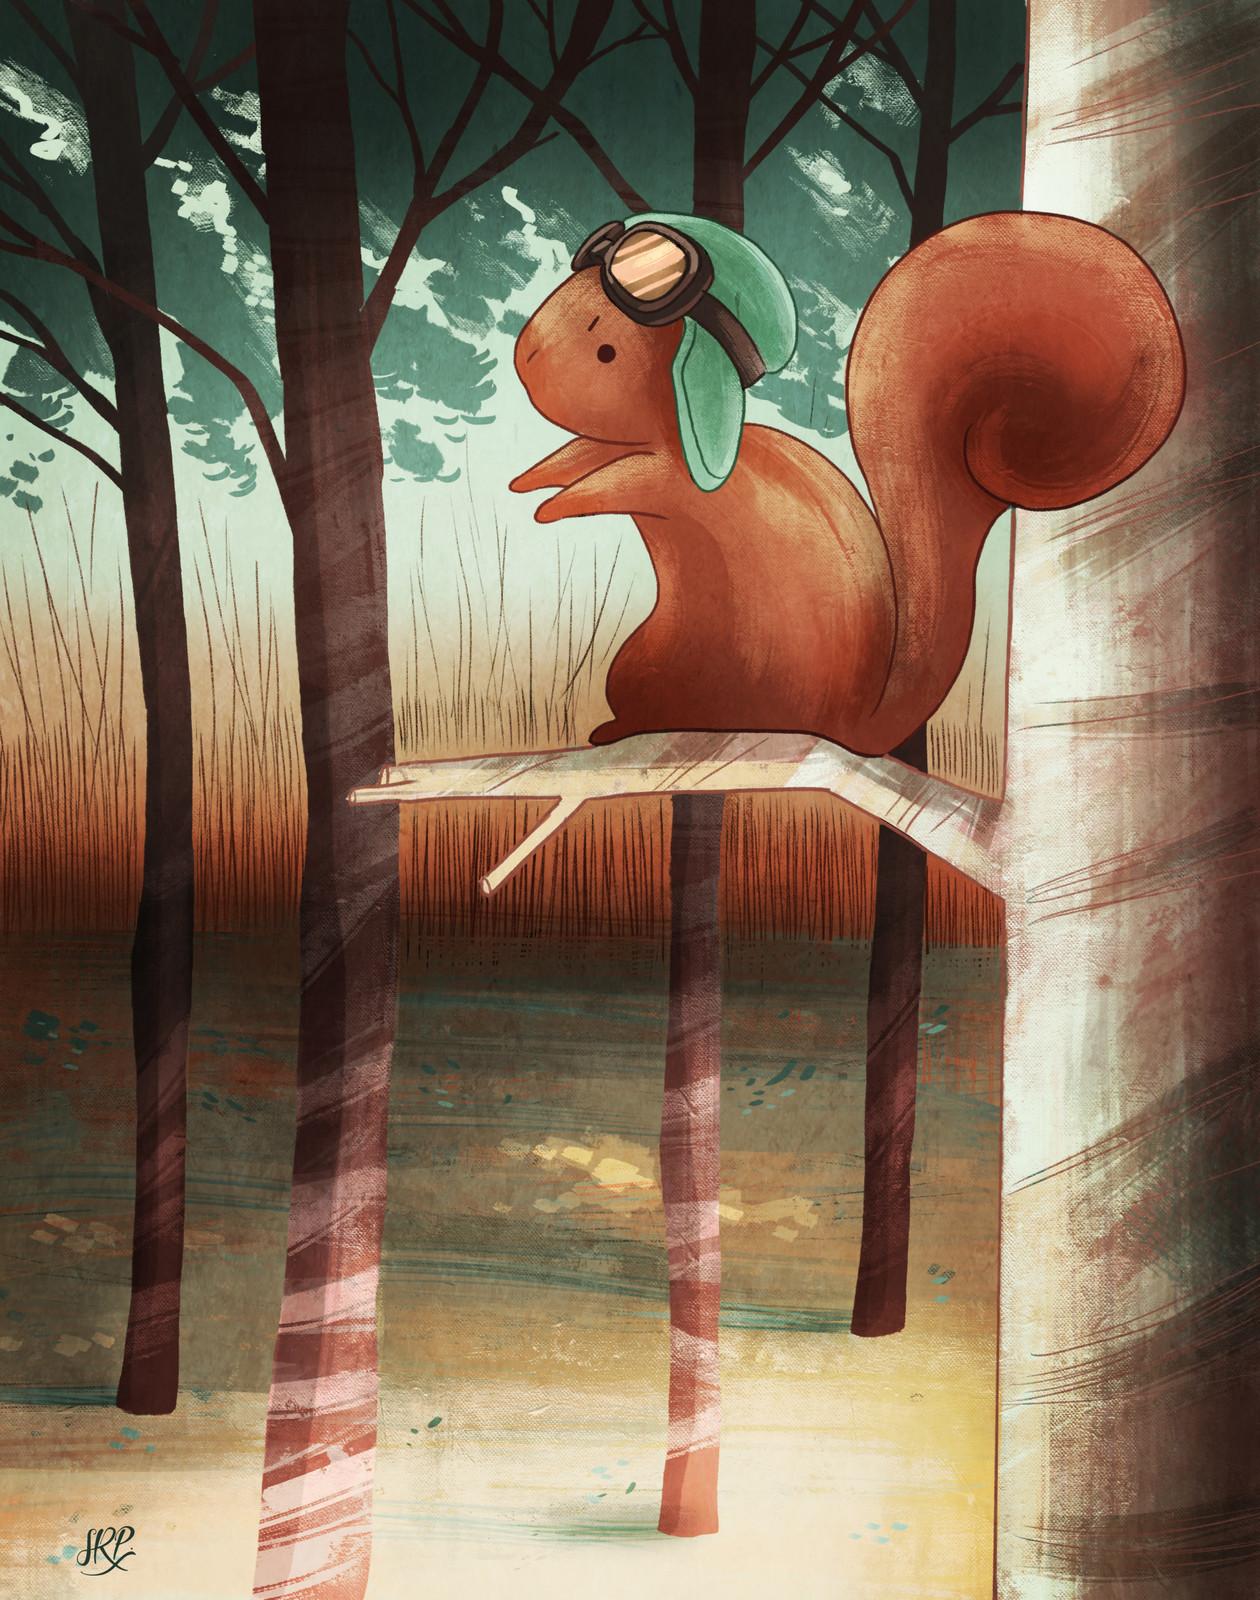 Squirrel -Ál's tale